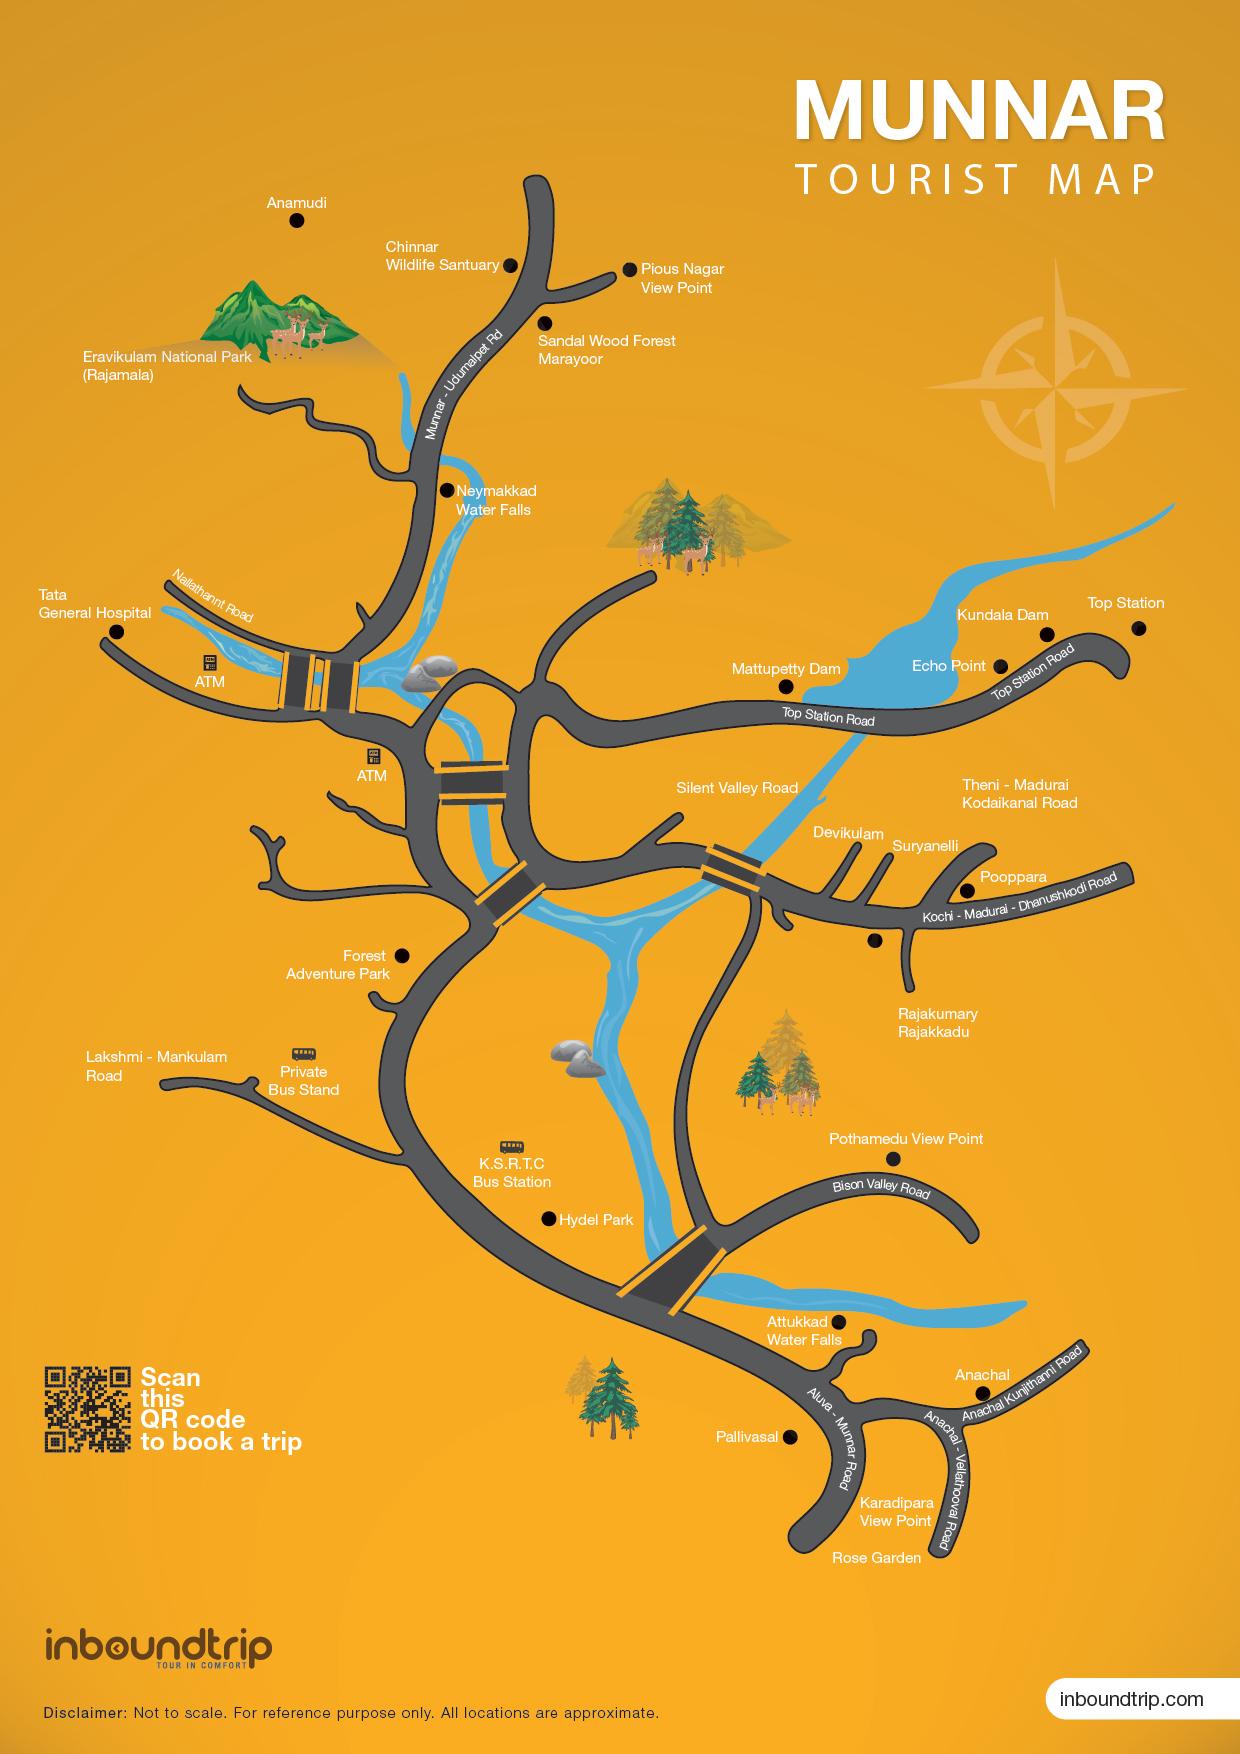 munnar tourist map – inboundtripcom - munnartouristmap